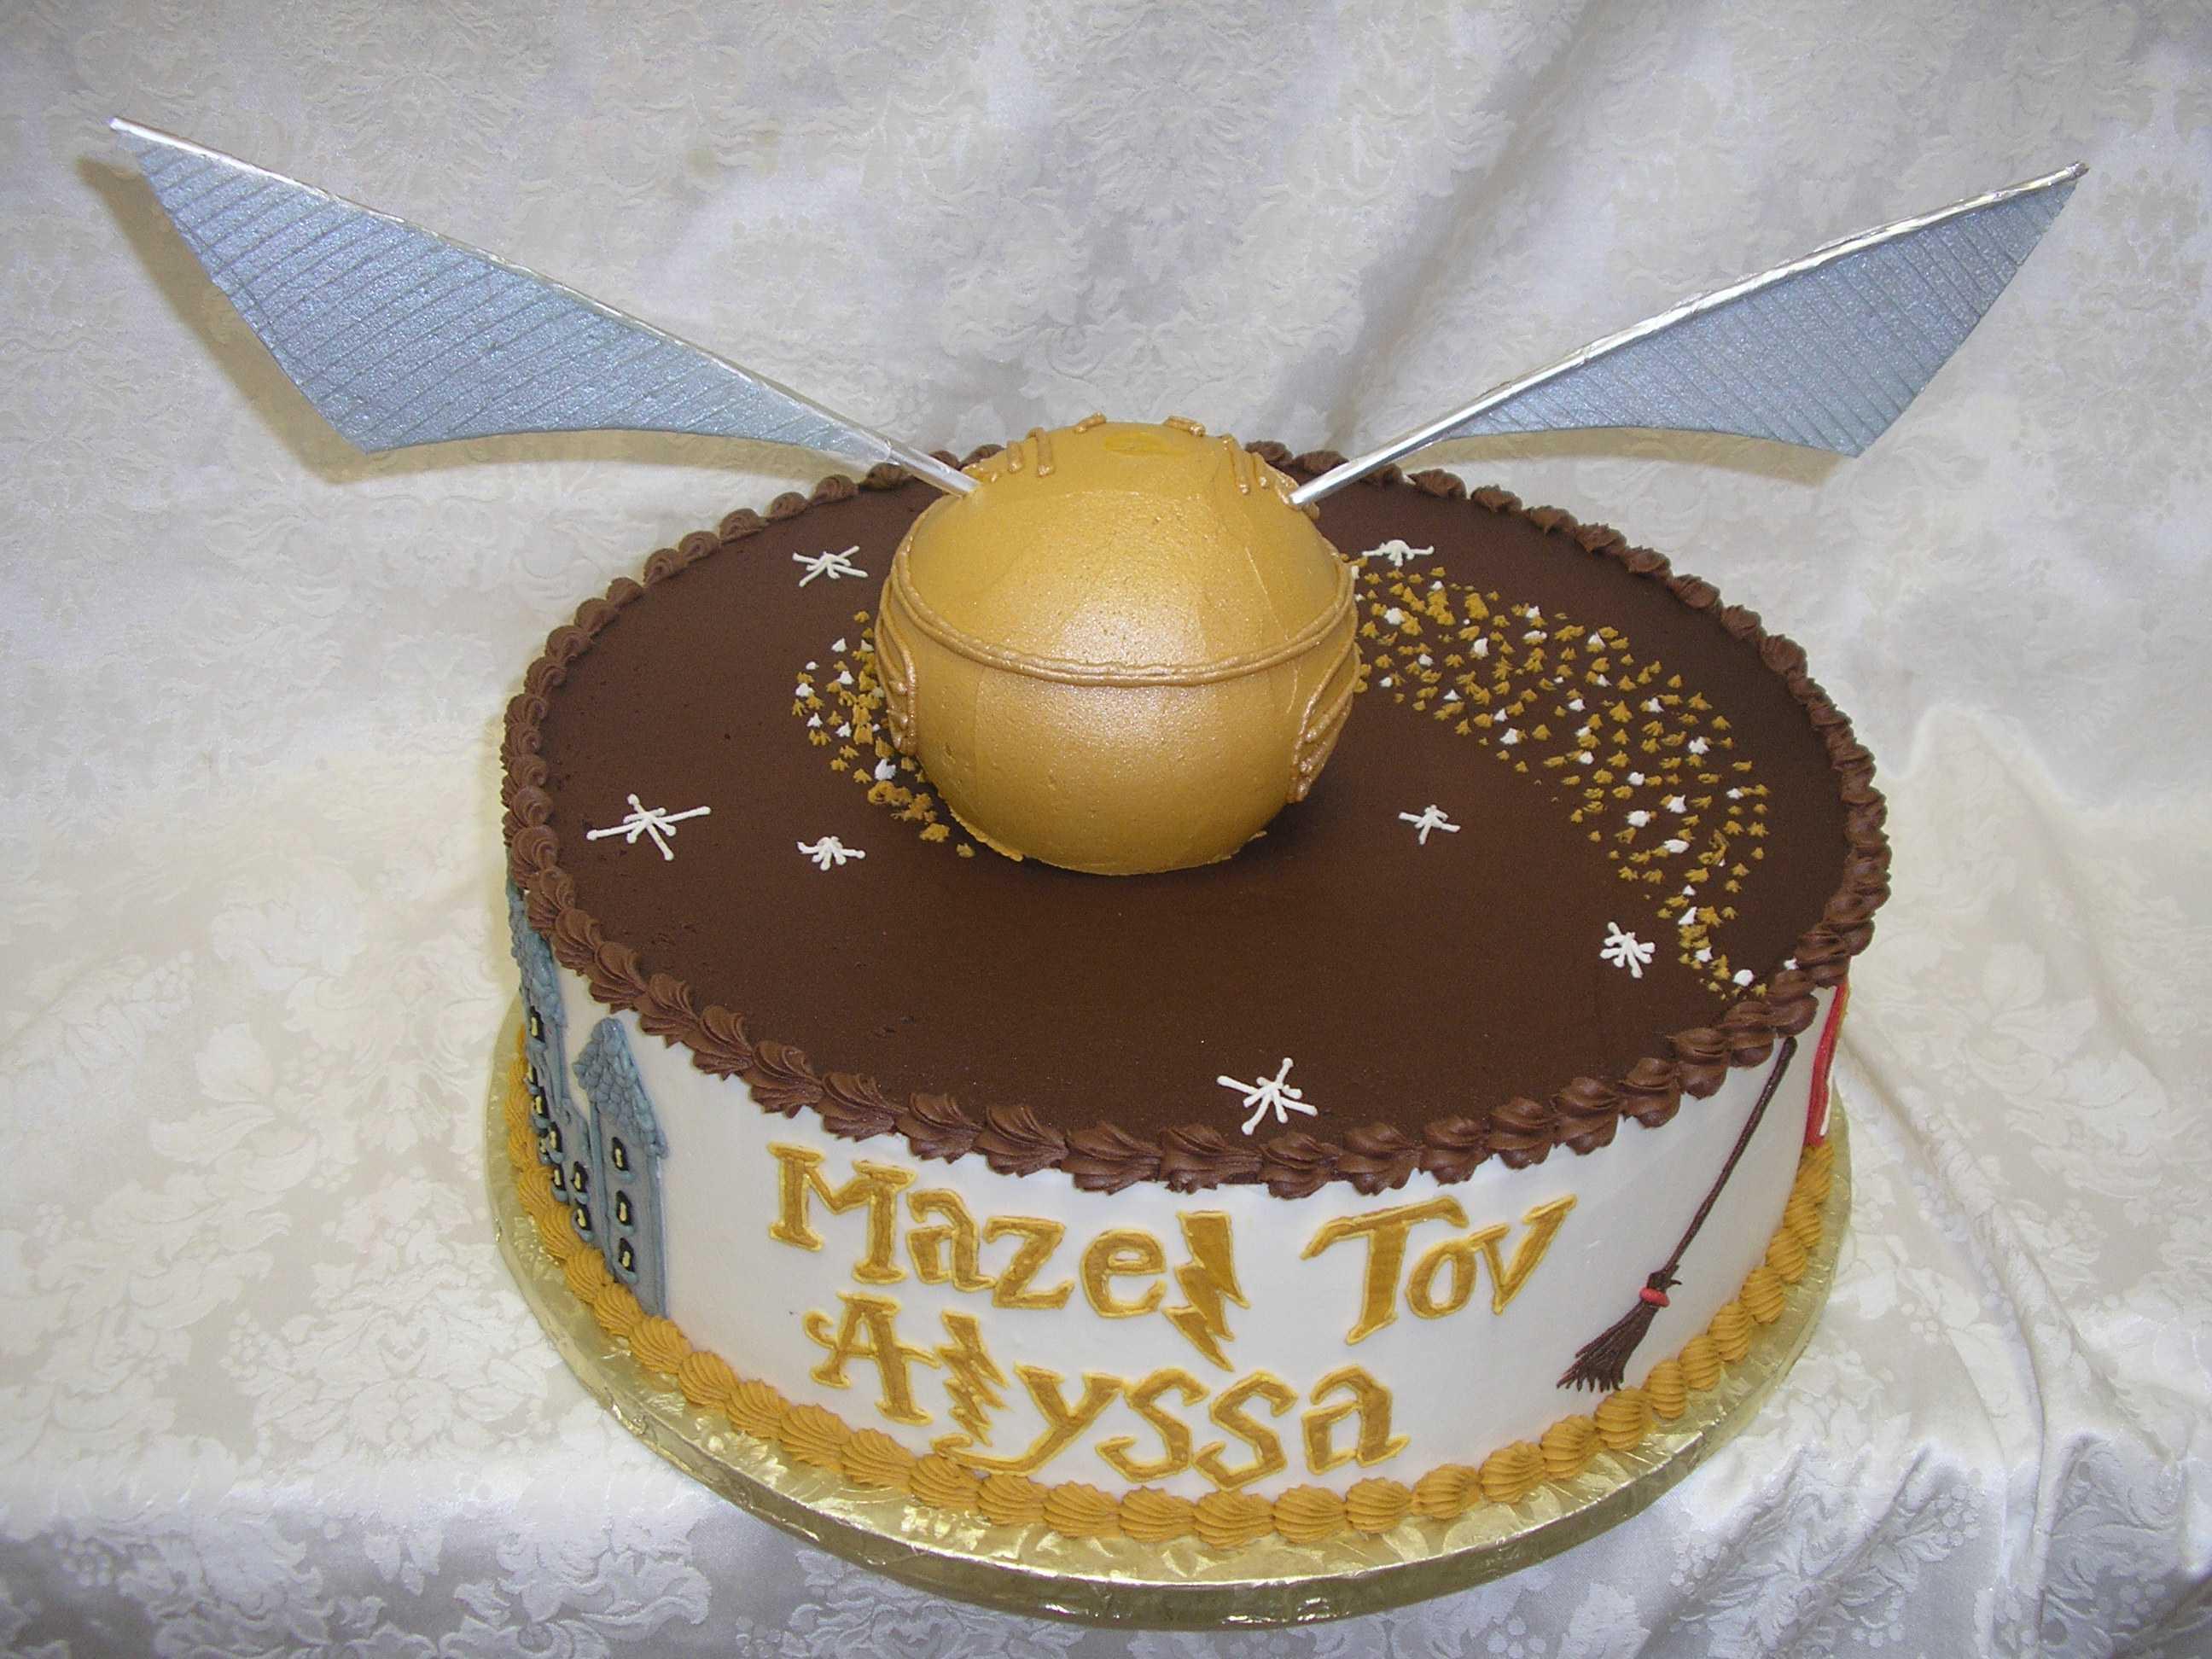 harry potter cake, golden snitch cake